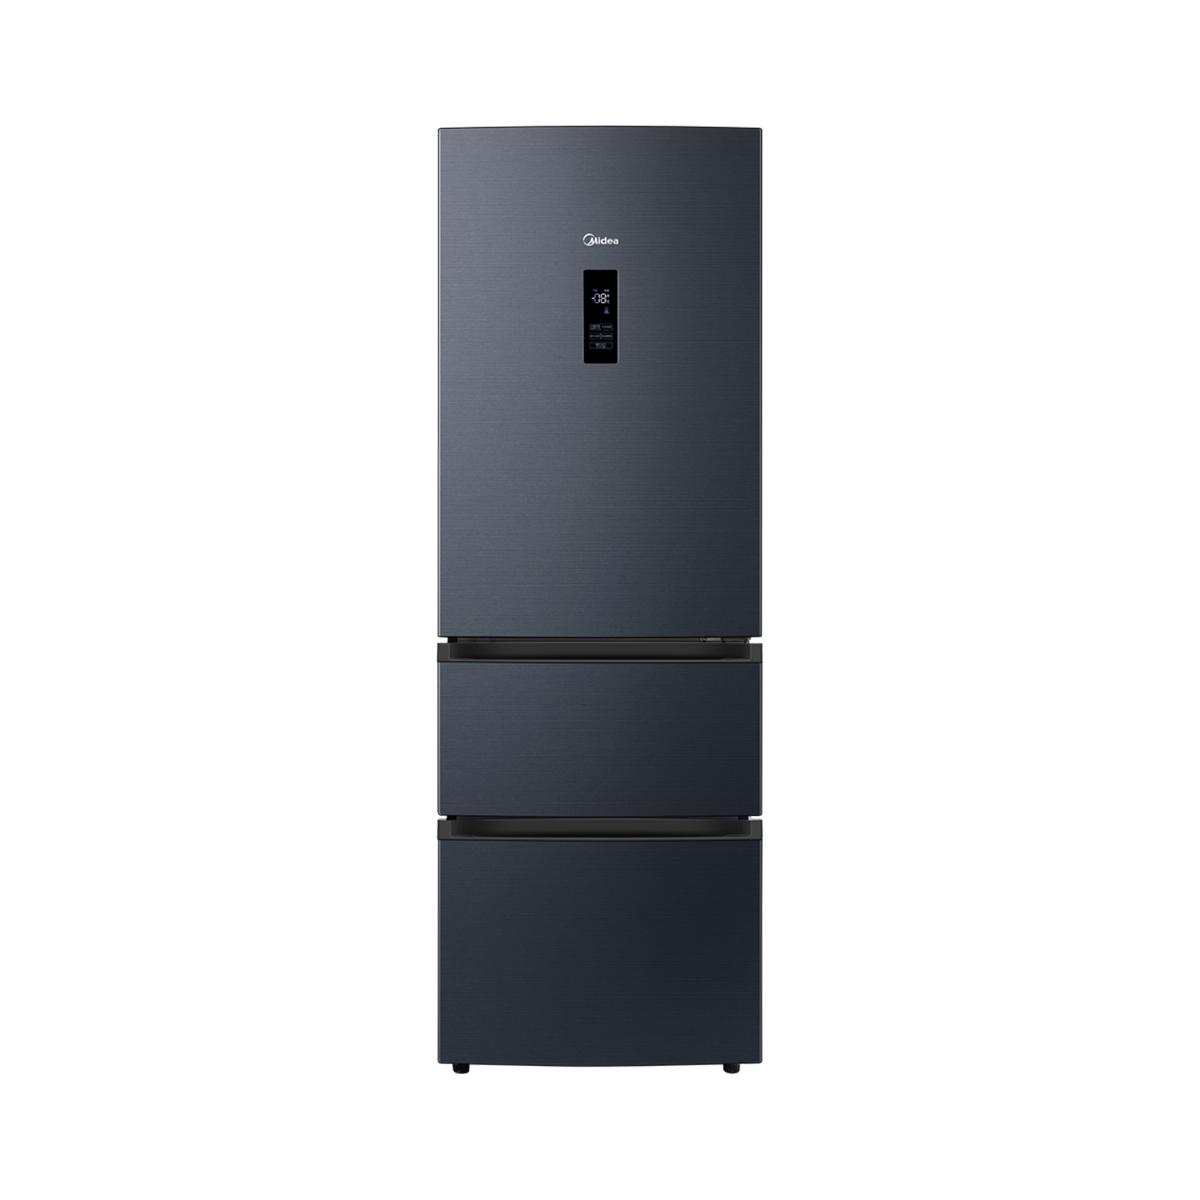 Midea/美的 BCD-325WTPZM(E)冰箱 说明书.pdf